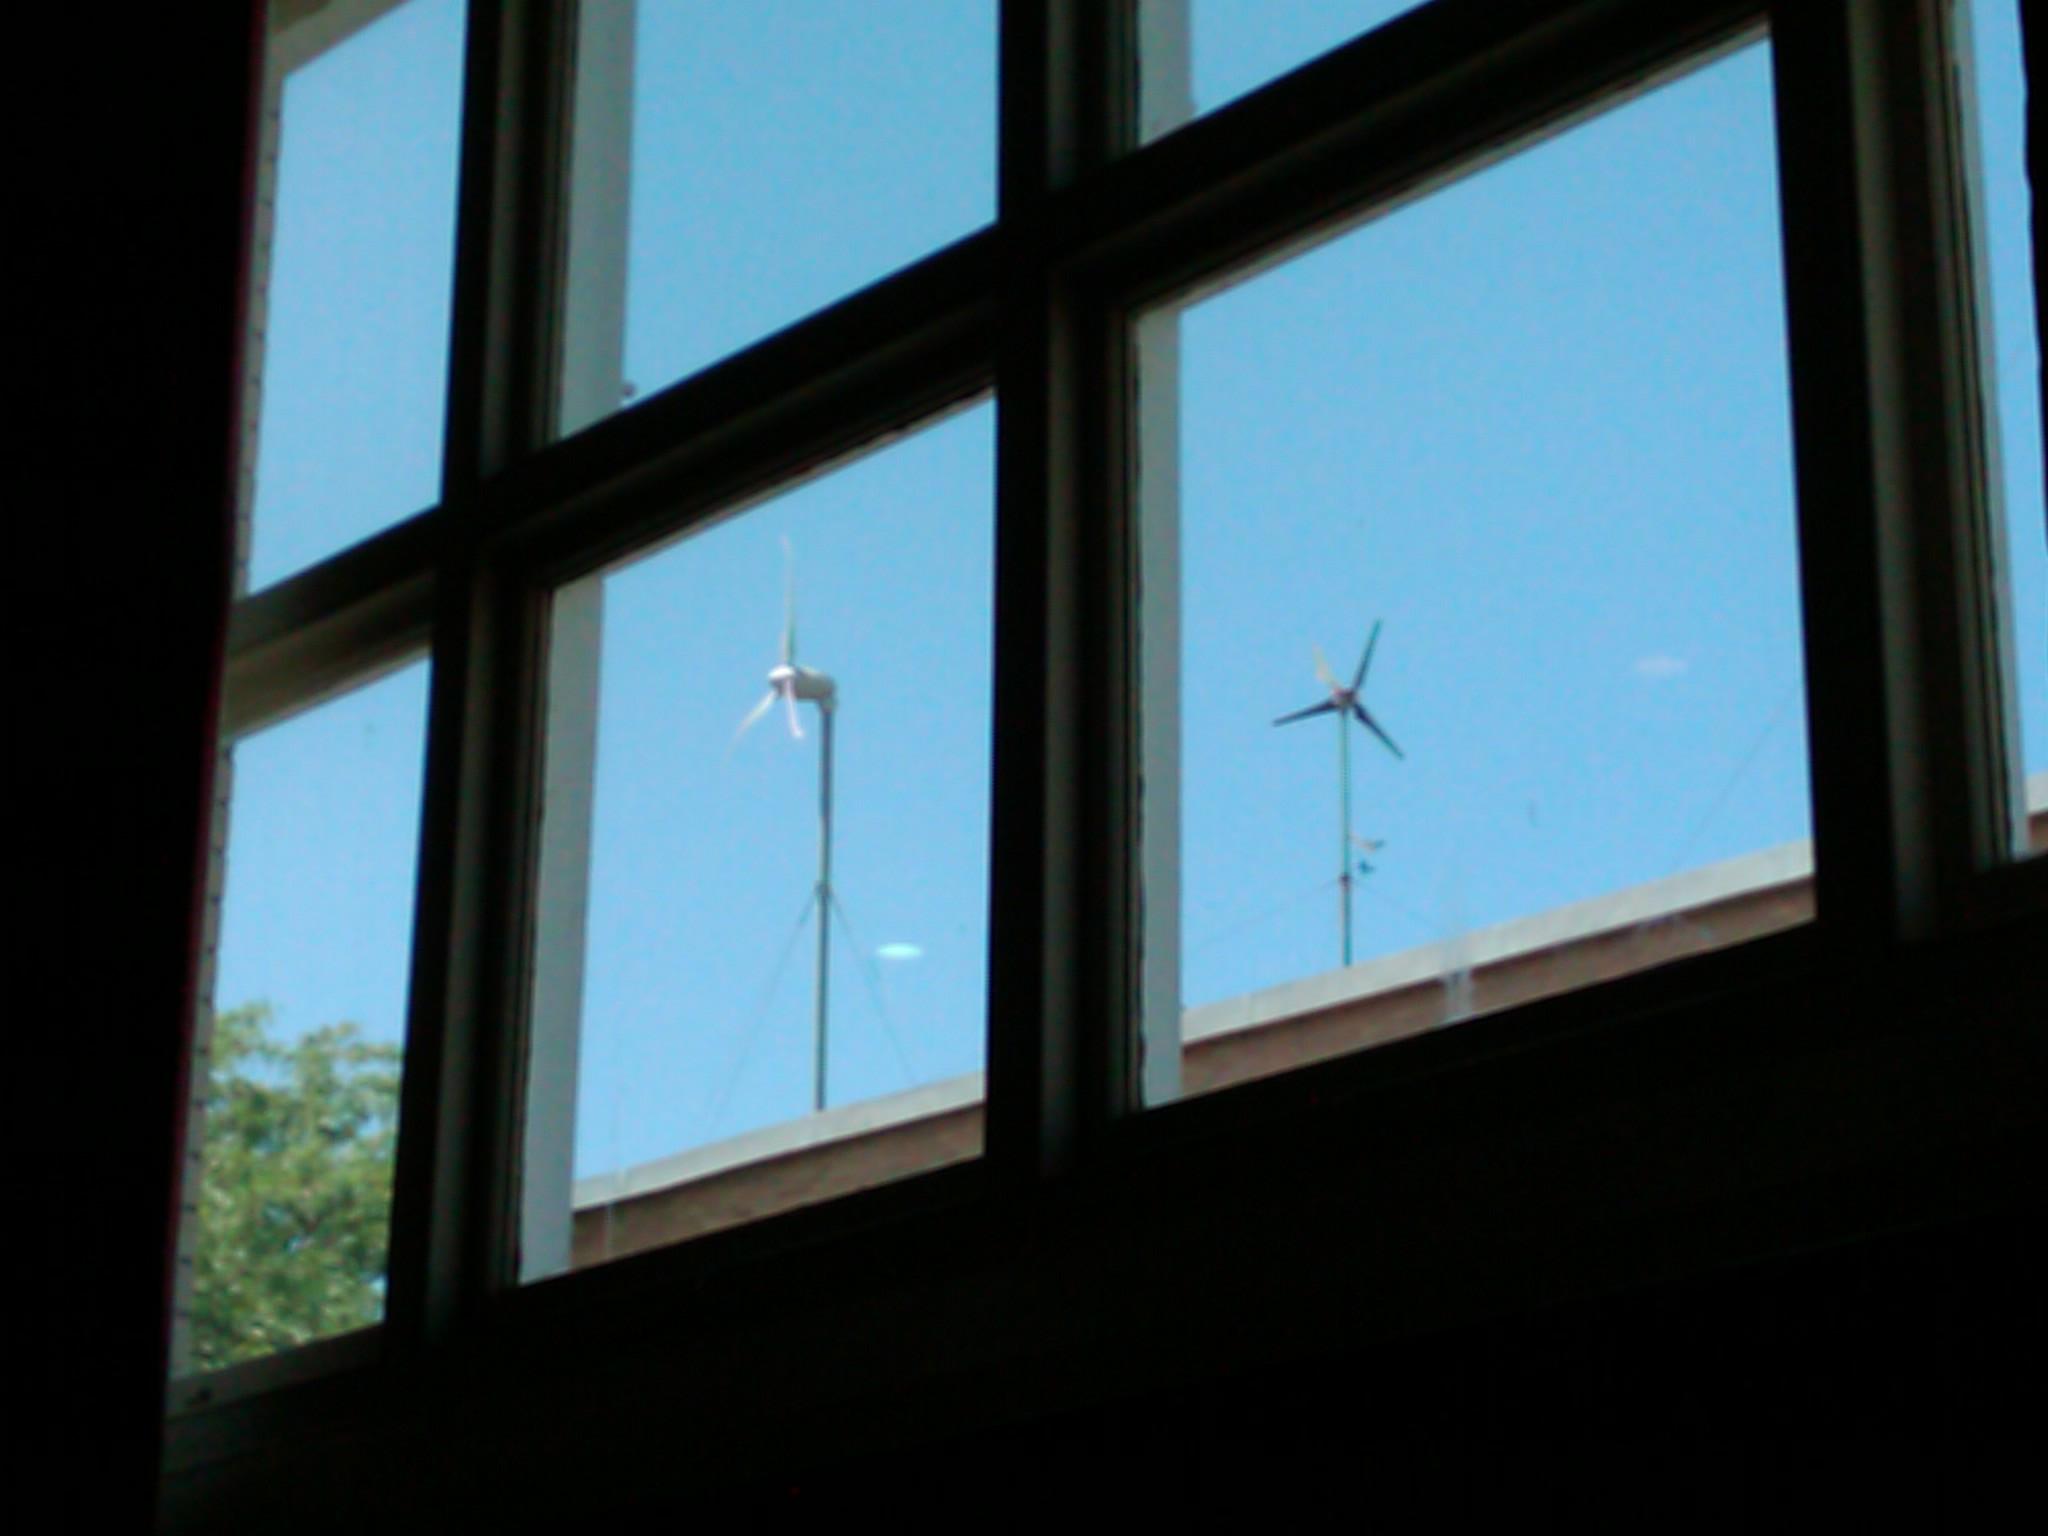 UMass Lowell Wind Turbines